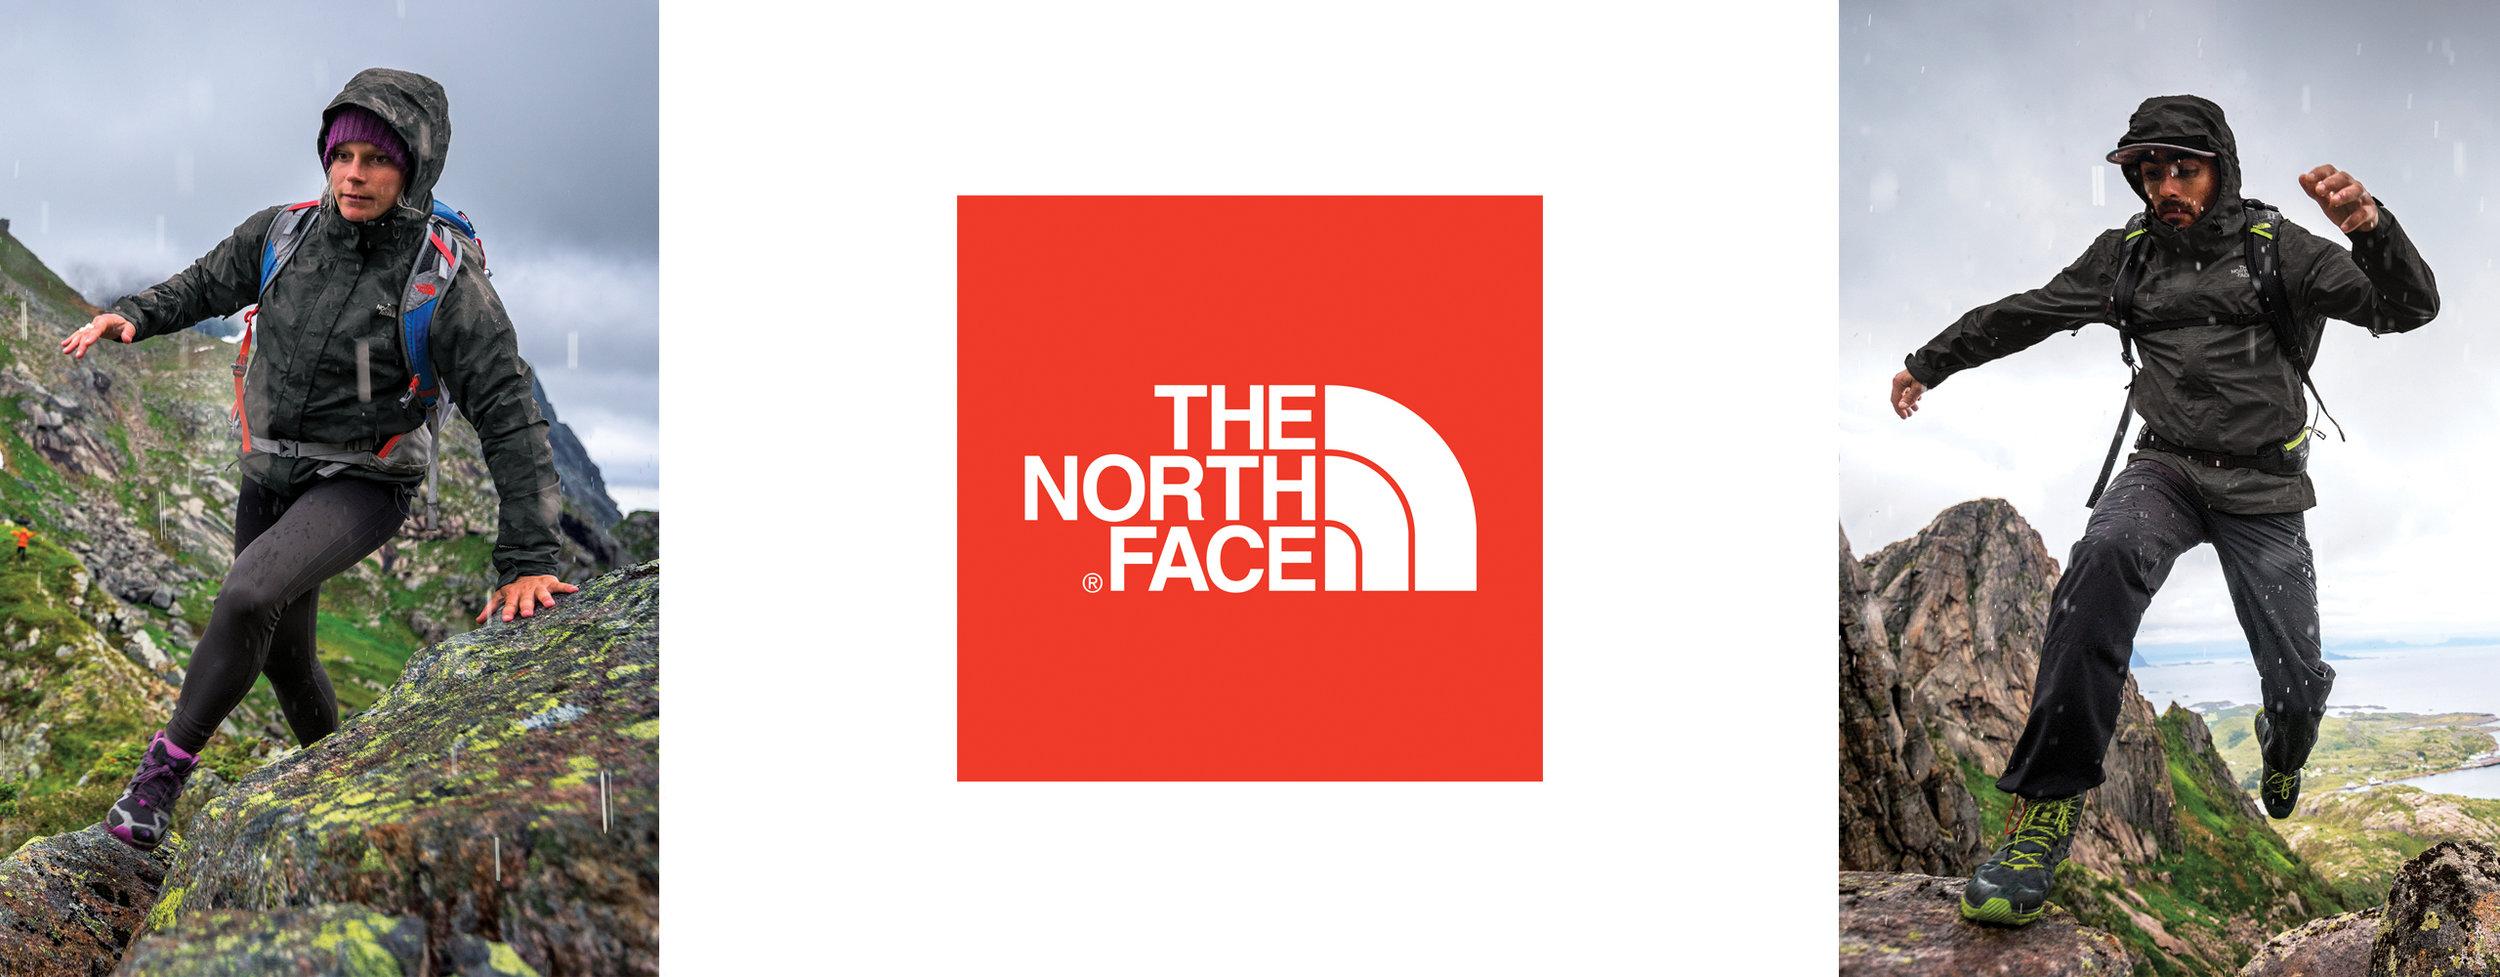 north face login.jpg